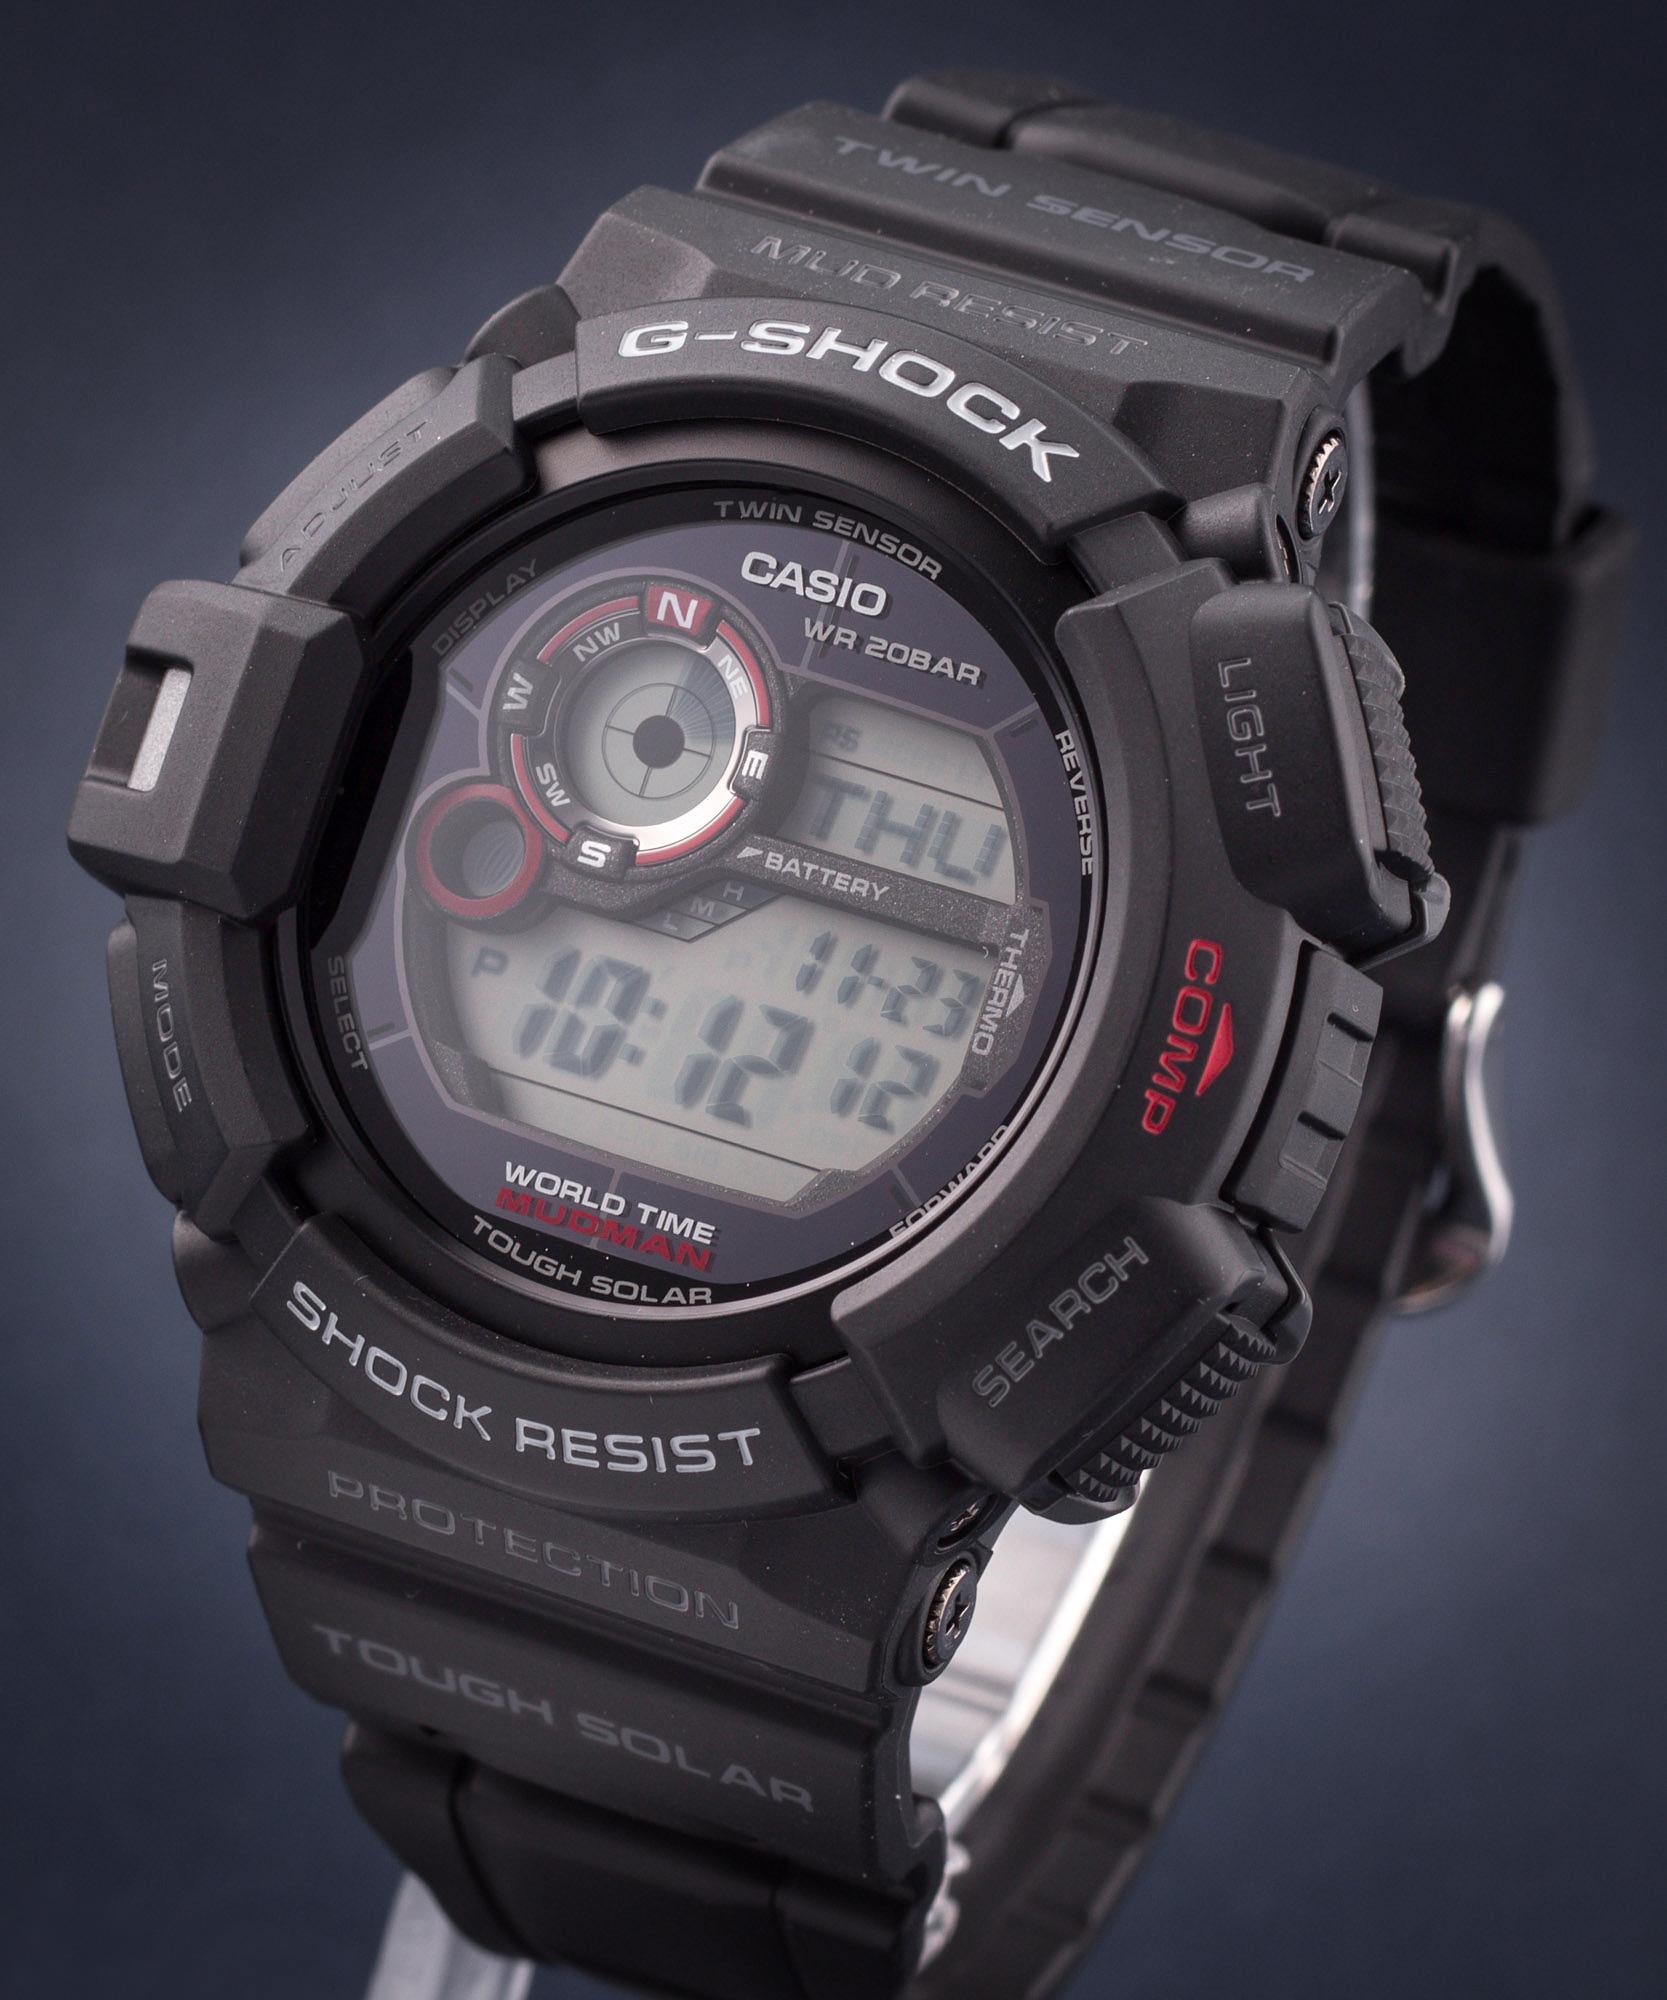 Zegarek Męski Casio G-Shock Mudman G-9300-1ER • Zegarownia.pl 37f74a0c8bd9